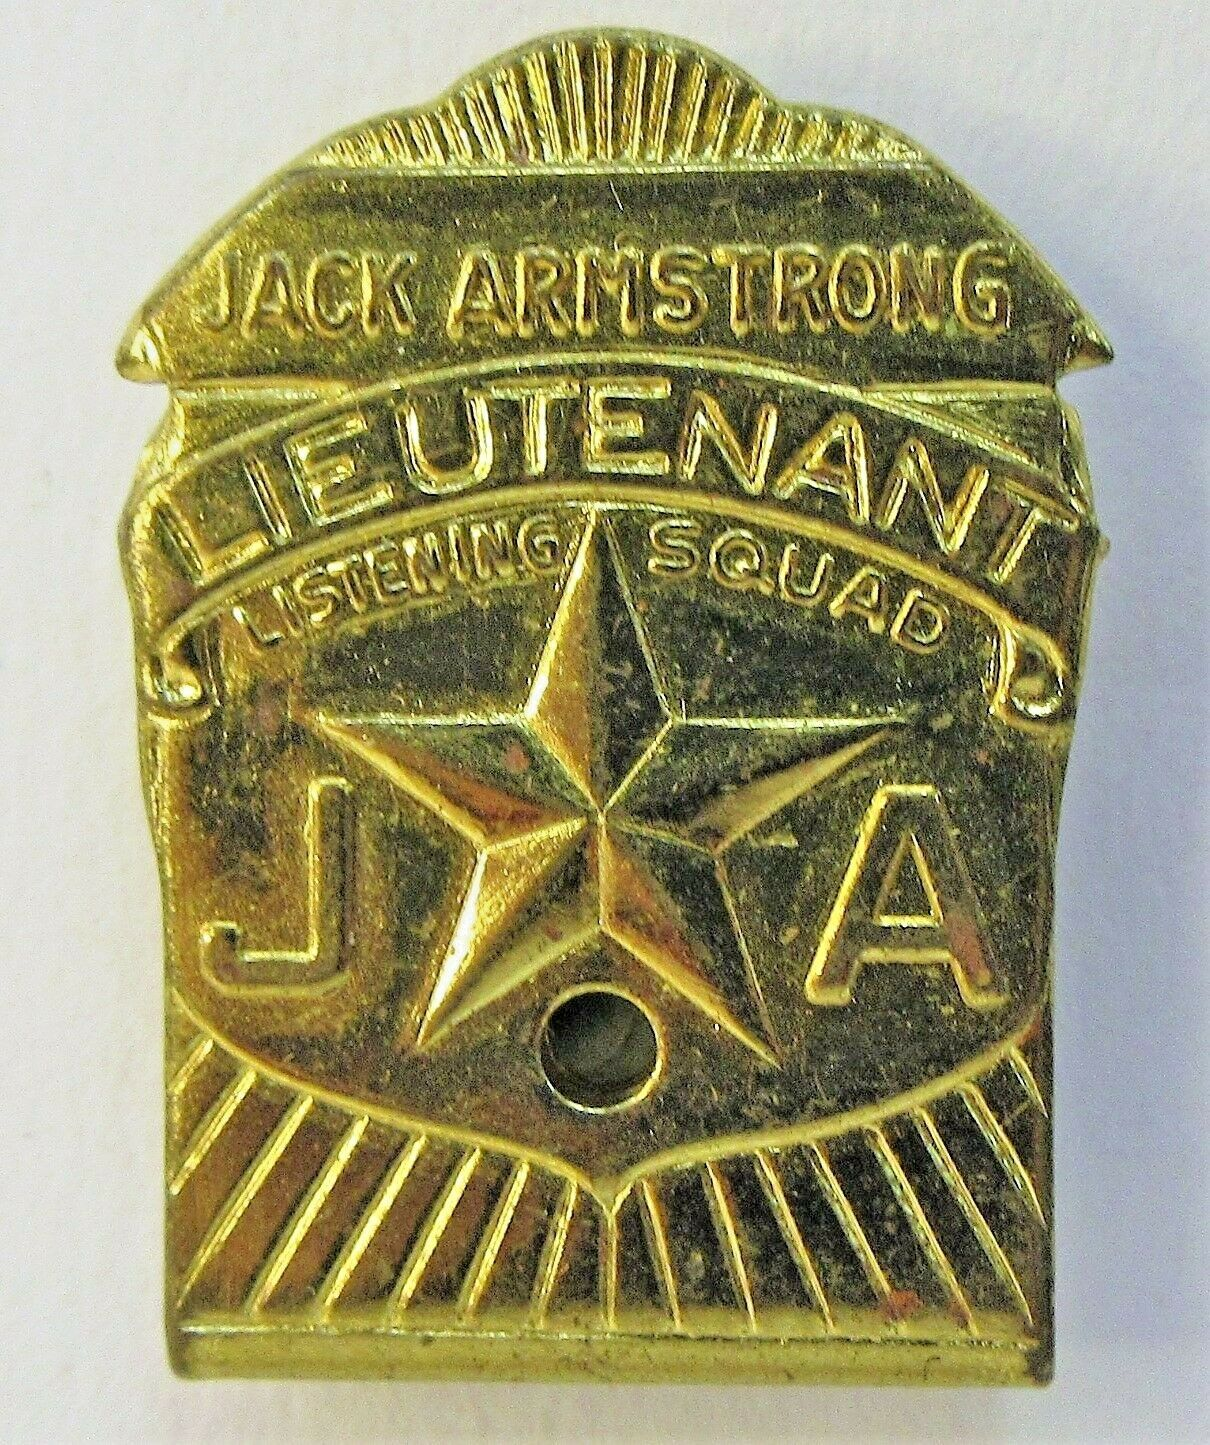 Rare 1940 JACK ARMSTRONG LIEUTENANT LISTENING SQUAD radio premium HI-GRADE HI-GRADE HI-GRADE  e9f